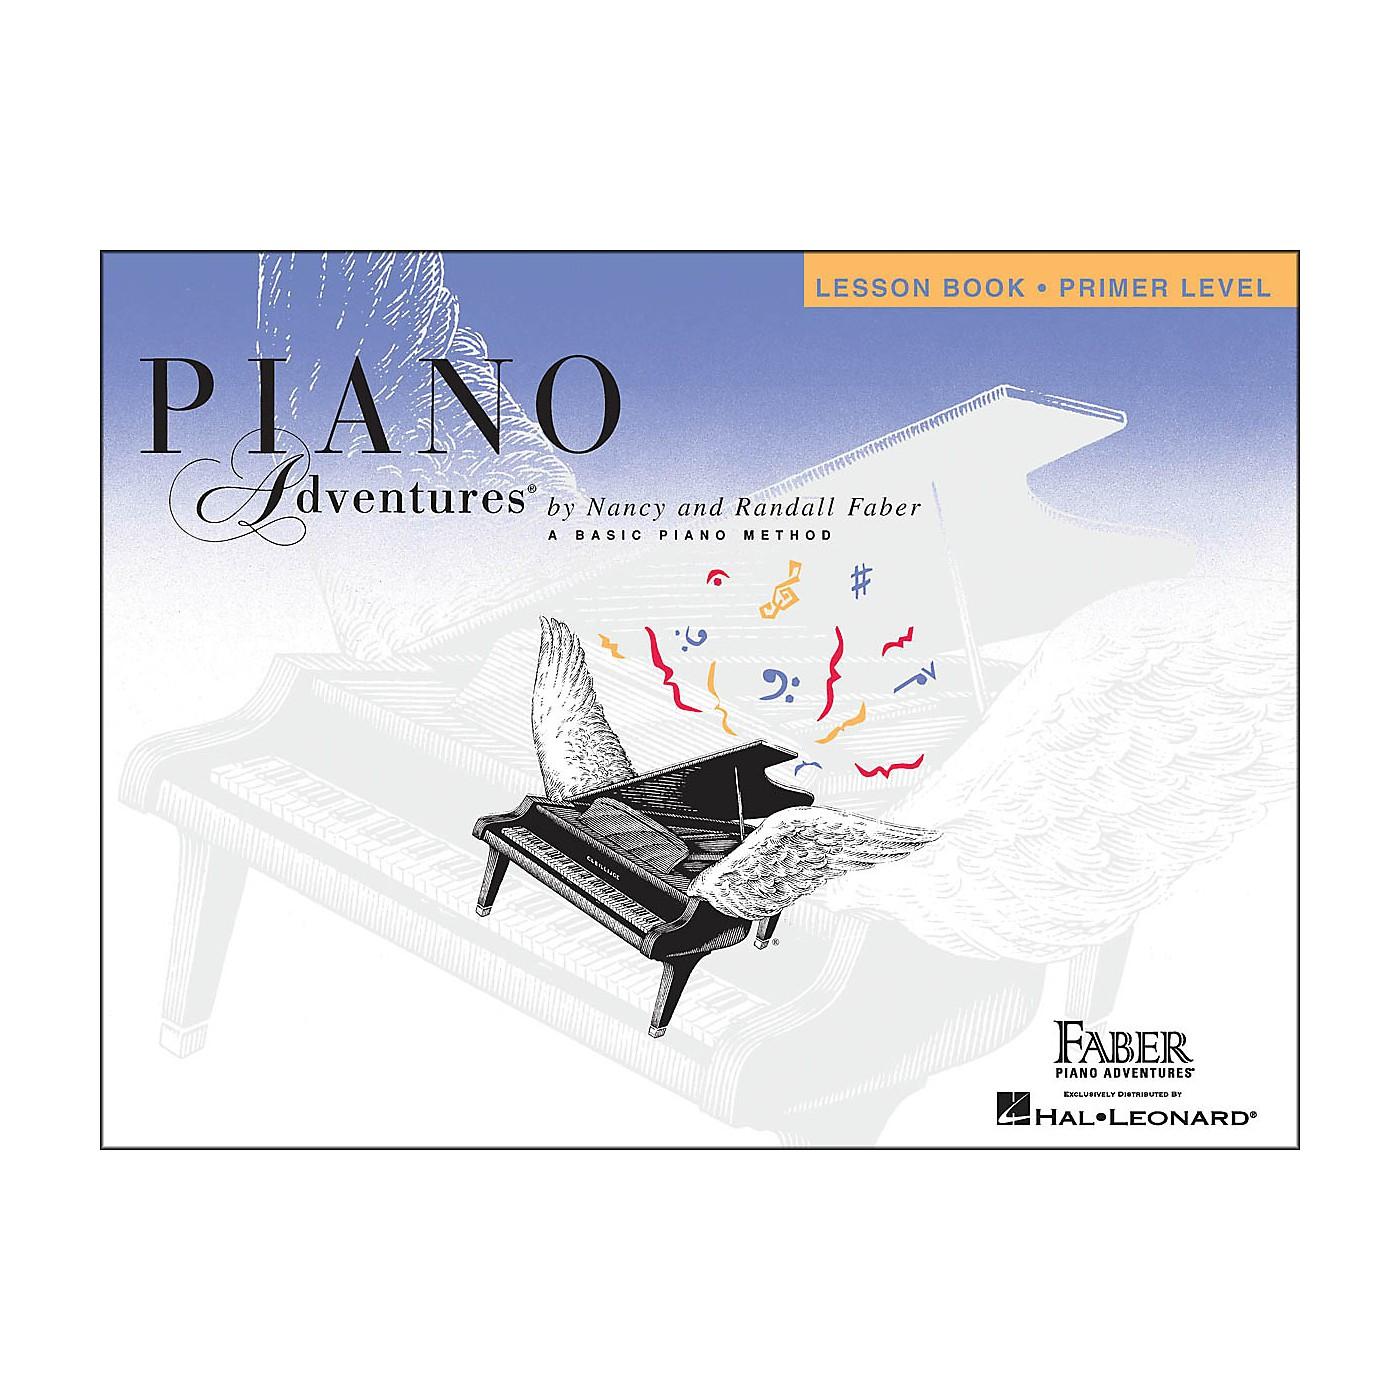 Faber Piano Adventures Piano Adventures Lesson Book Primer Level thumbnail